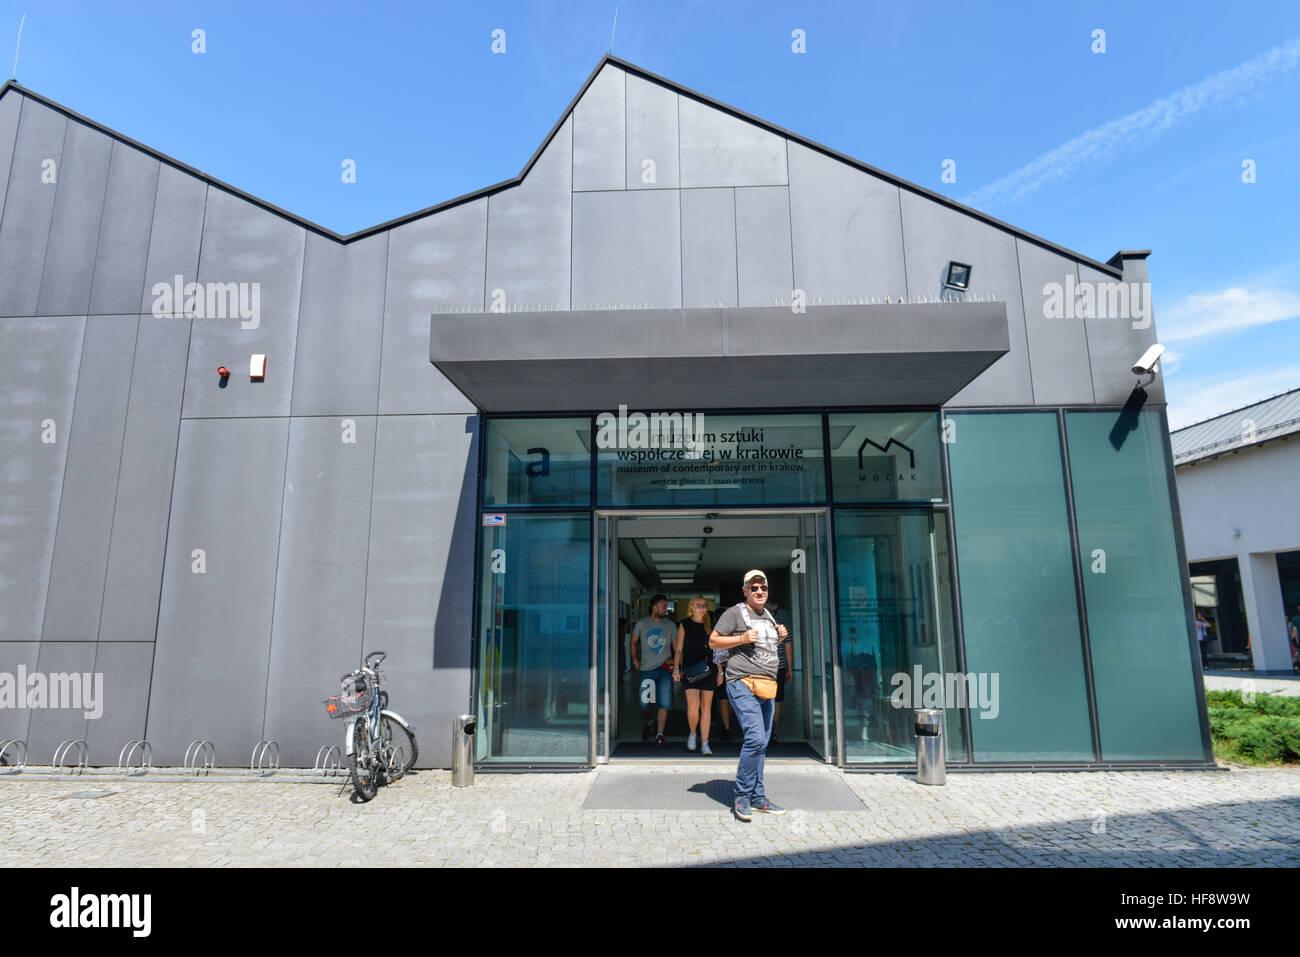 MOCAK, Museum, Lipowa, Krakau, Polen, museum, Cracow, Poland - Stock Image